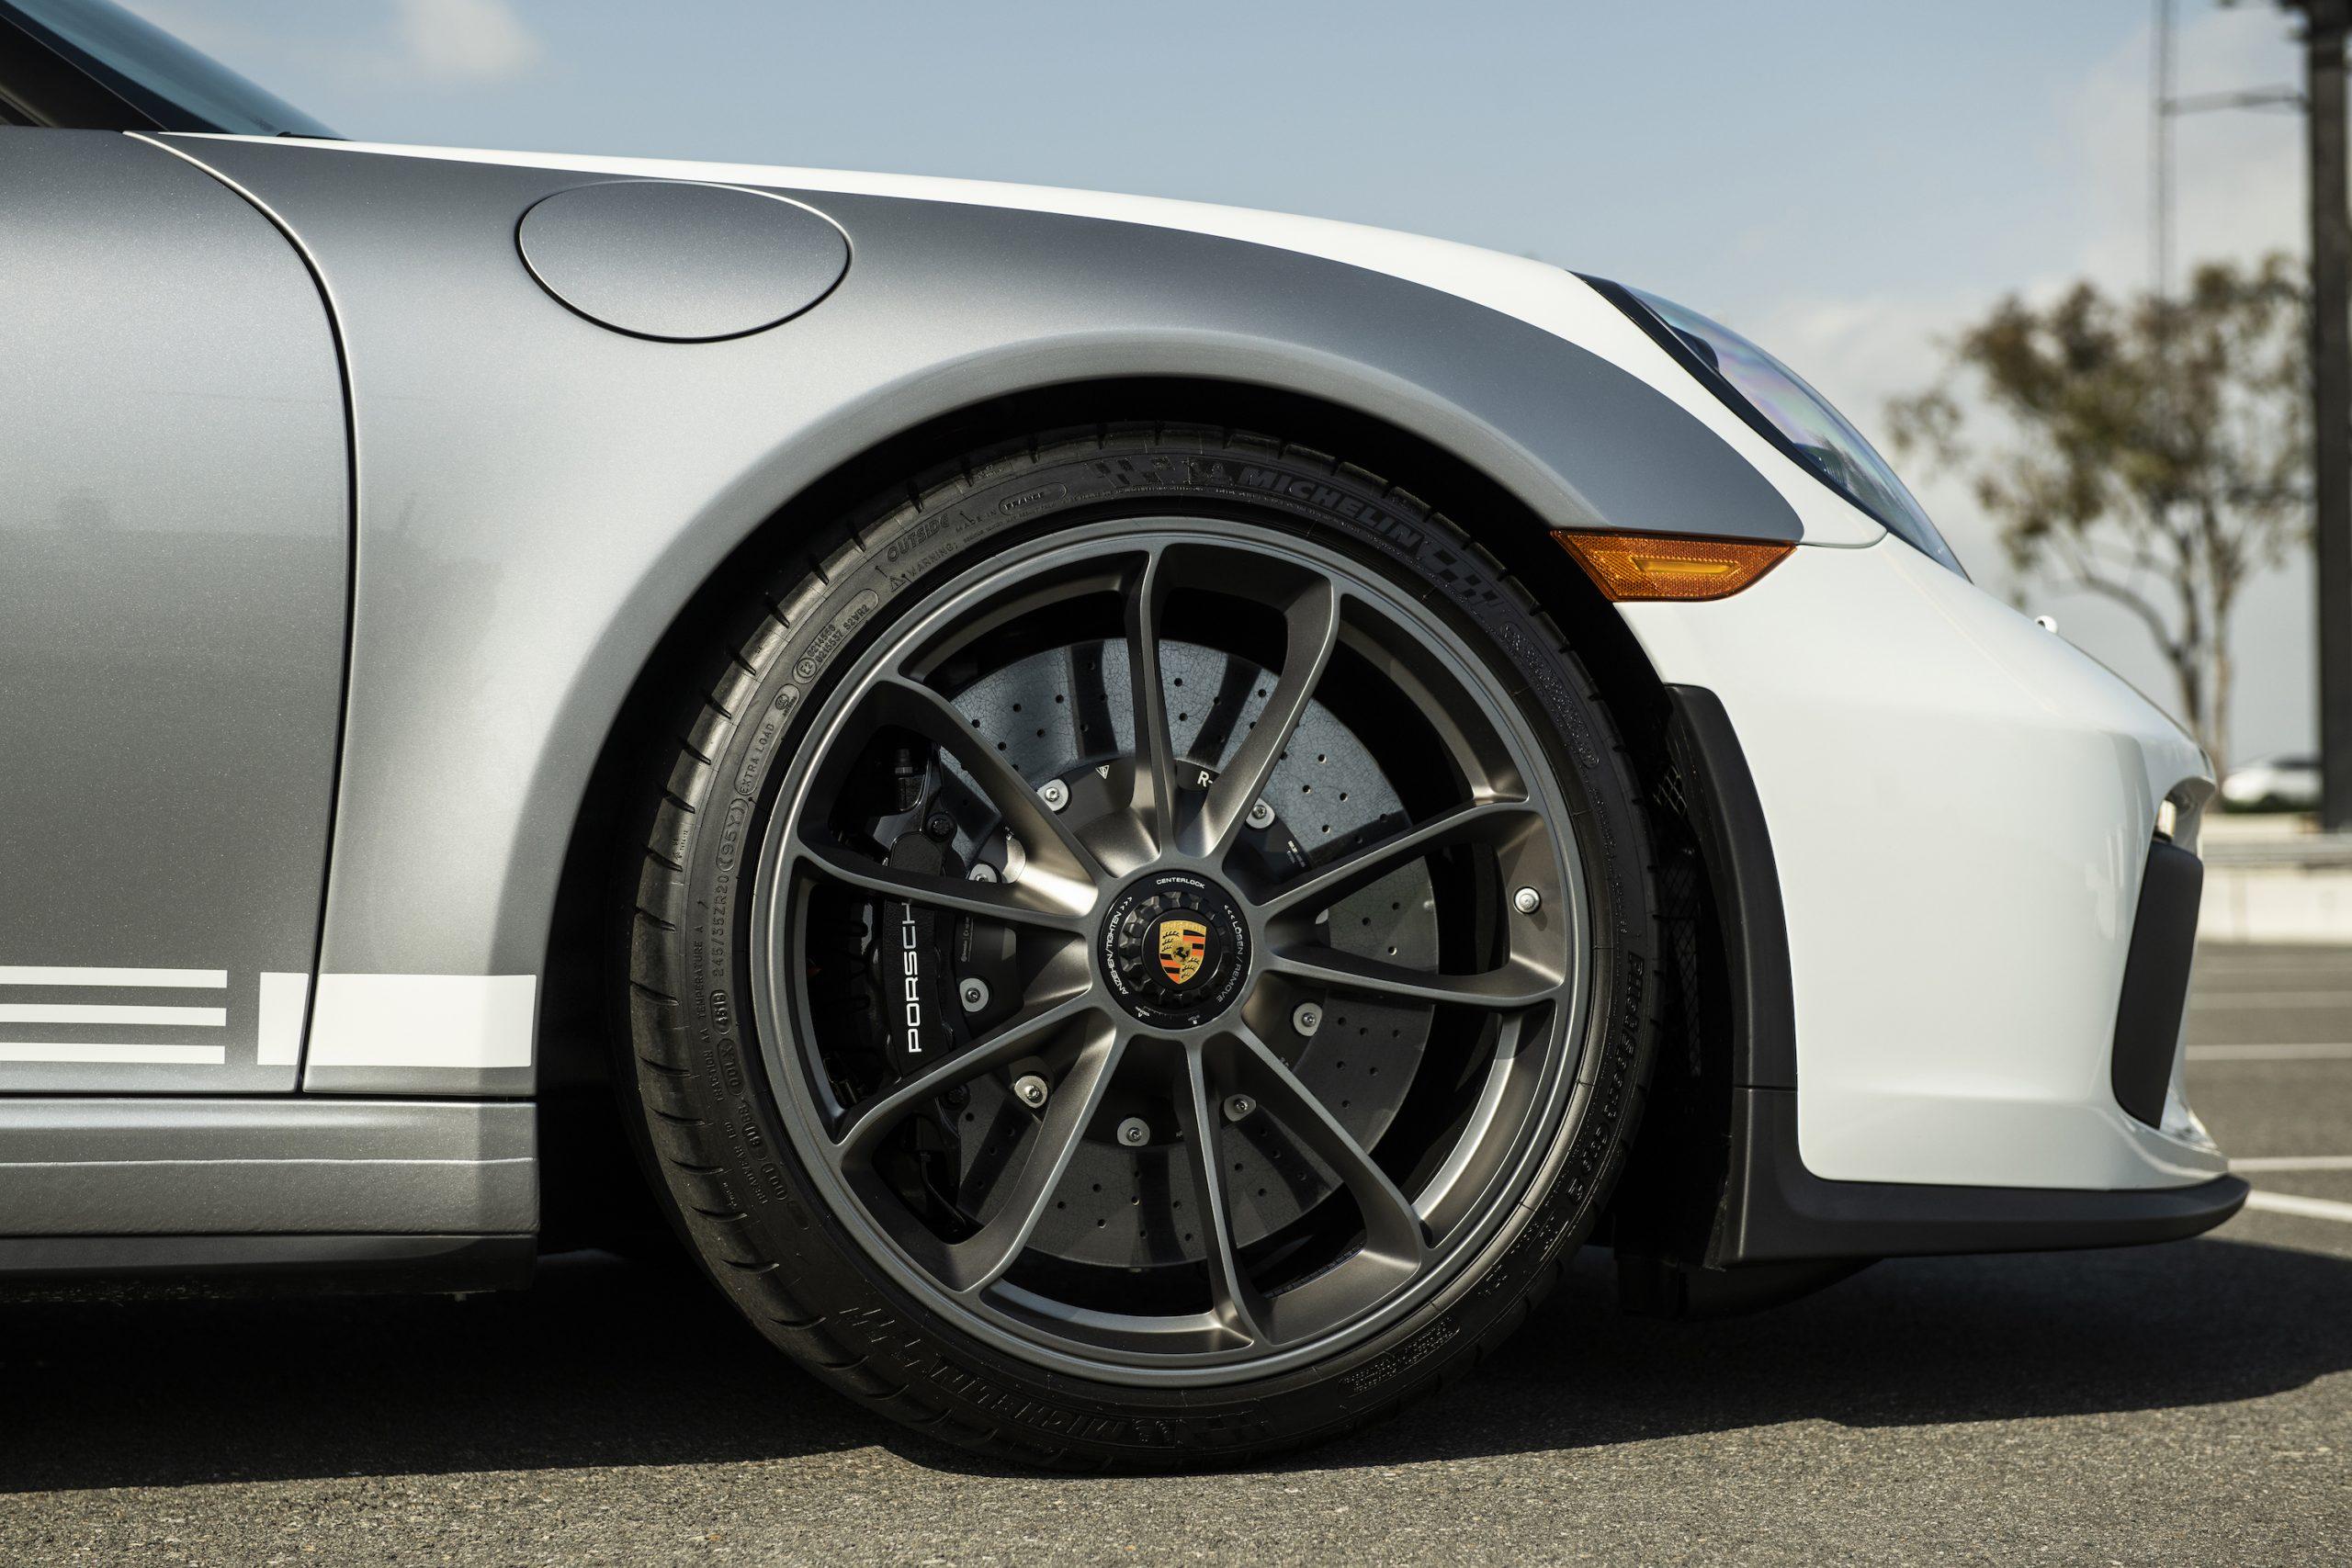 2019 Porsche 911 Speedster Heritage Design Front Wheel